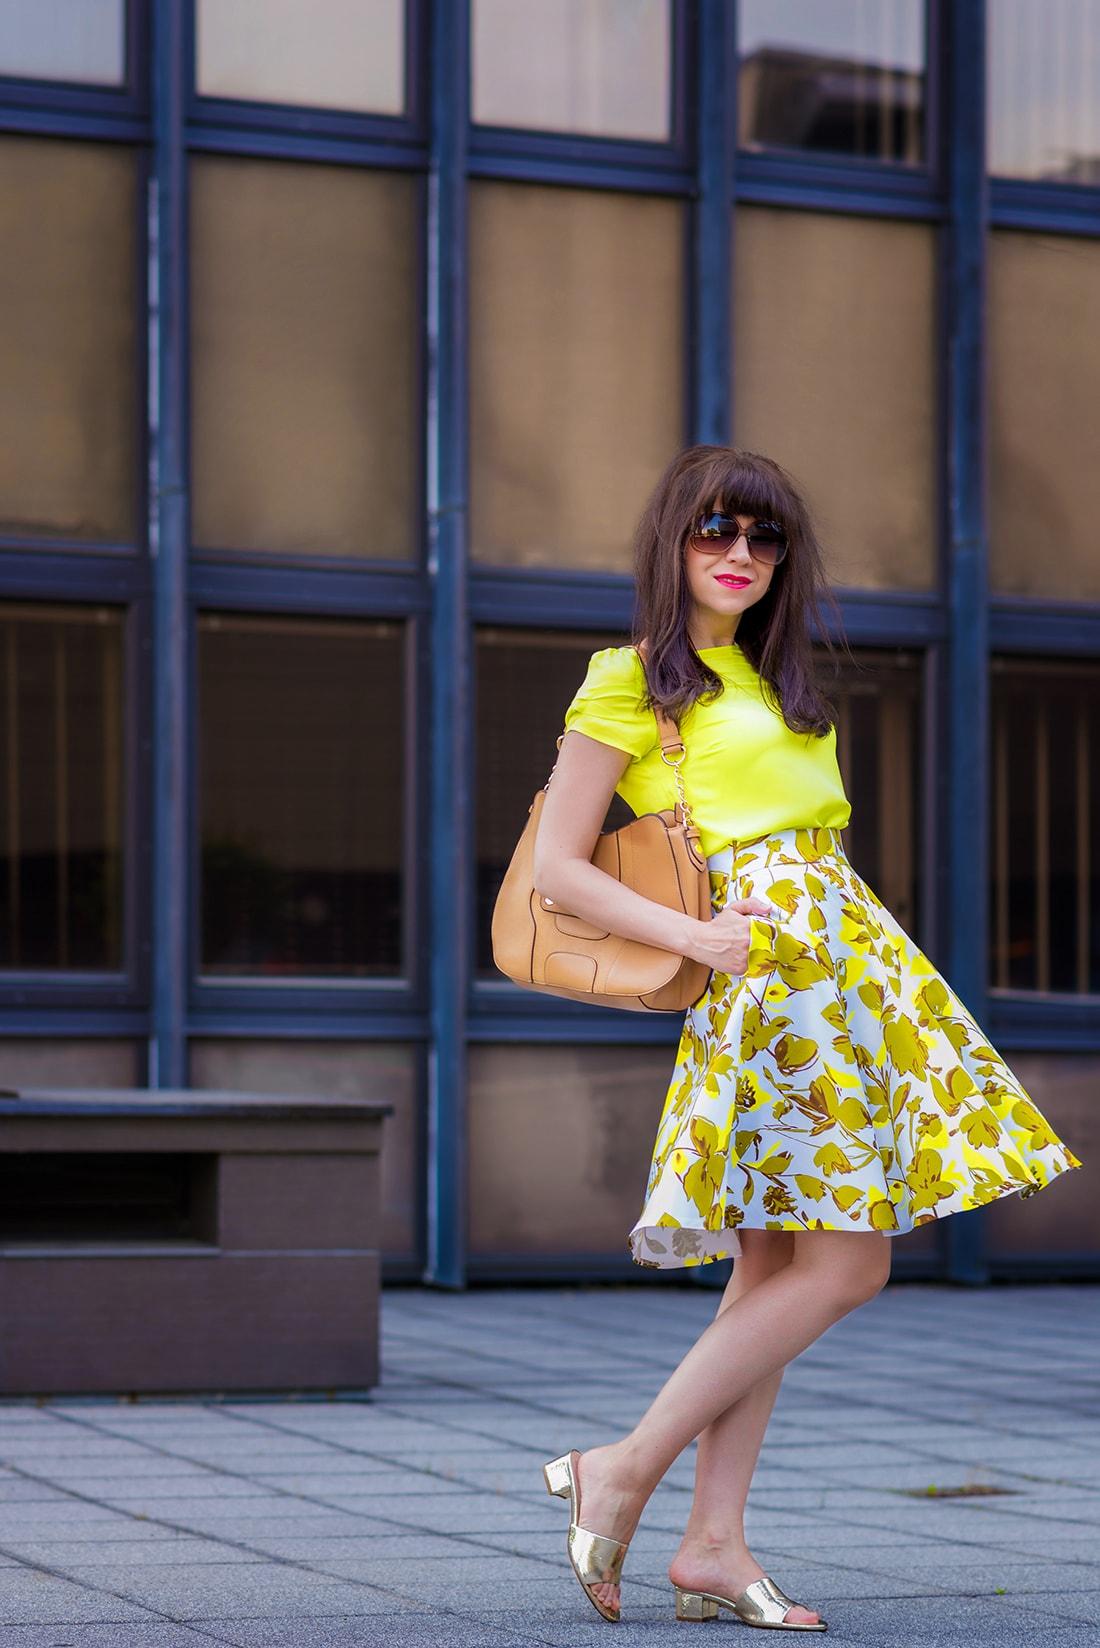 SUKŃA NA LETO OD MARGIFASHION_Katharine-fashion is beautiful_blog 4_Sukňa zelené kvety_Zlaté šľapky Sagan_Katarína Jakubčová_Fashion blogger